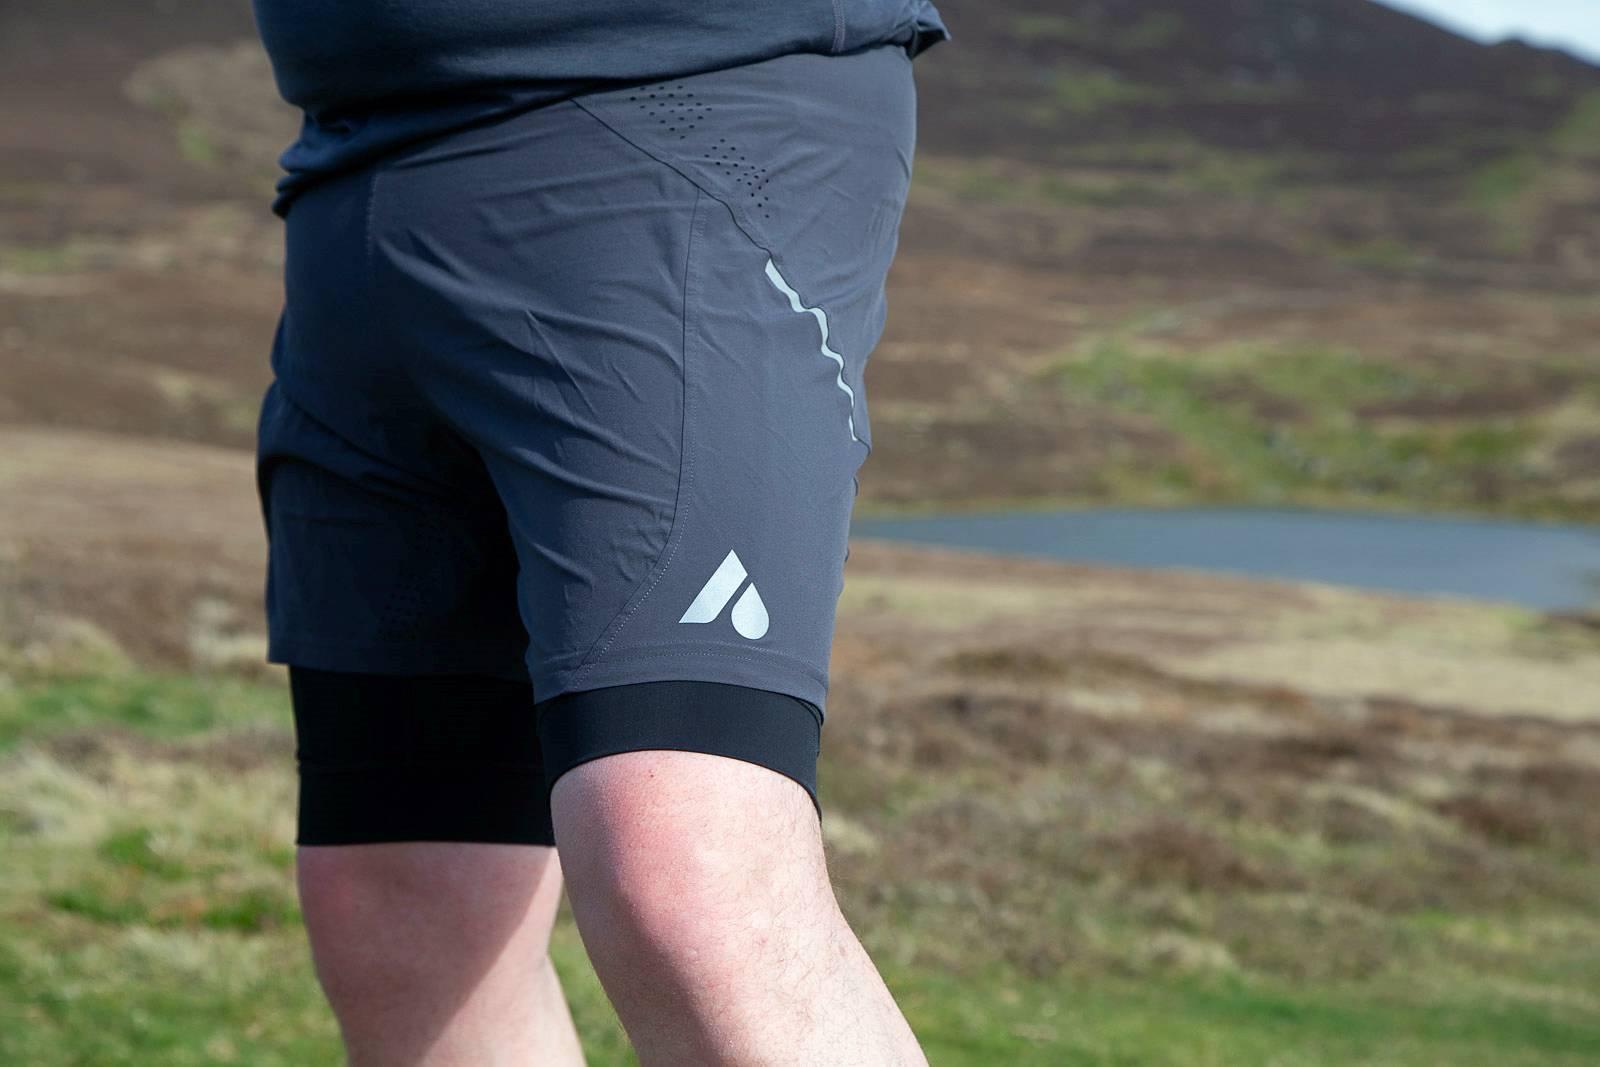 Aussie Grit Apparel Flint Running Long Sleeve Top and Shorts Review ... 926d7649b